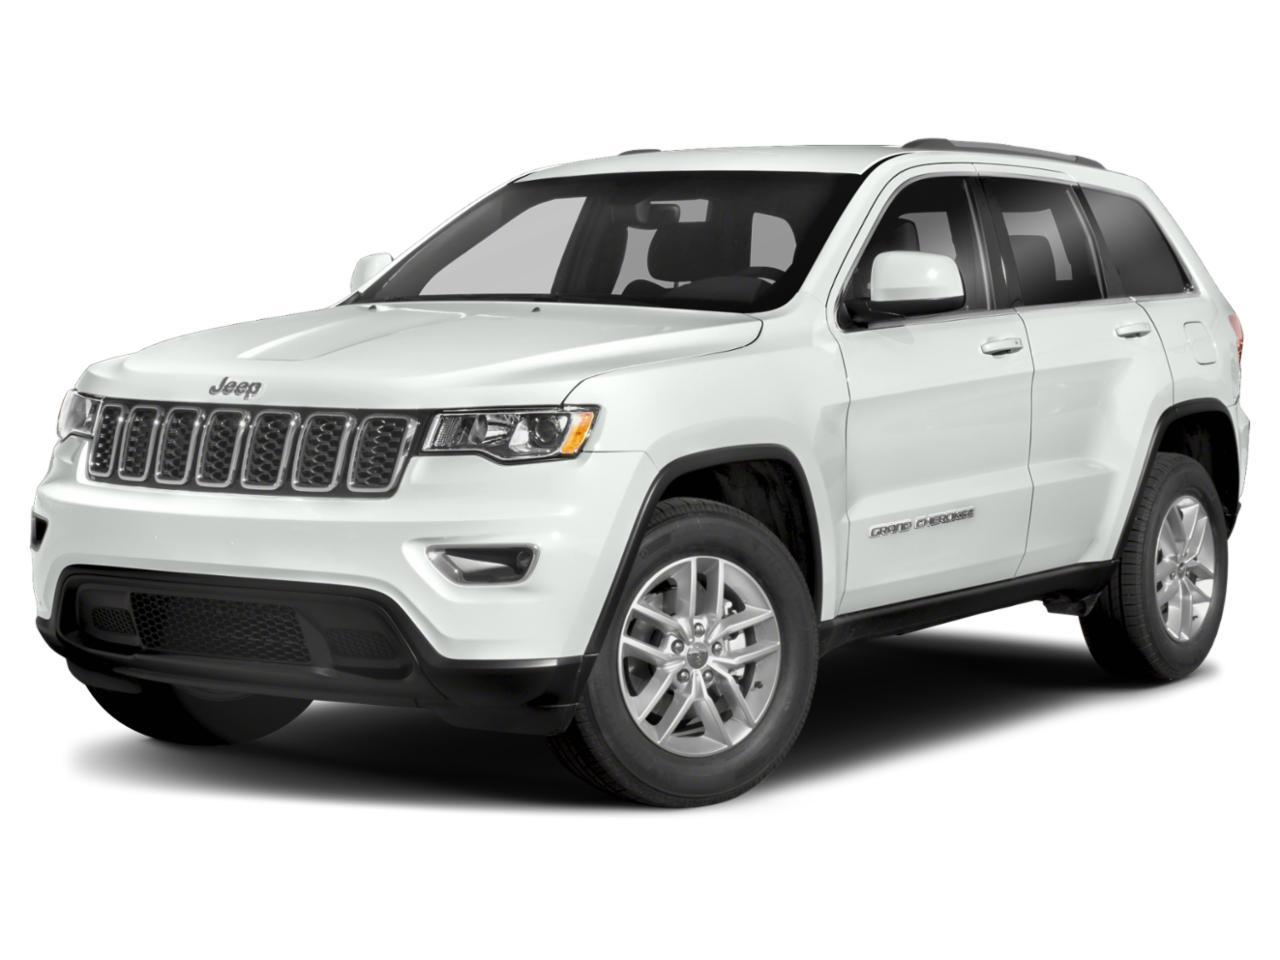 2018 Jeep Grand Cherokee Vehicle Photo in Killeen, TX 76541